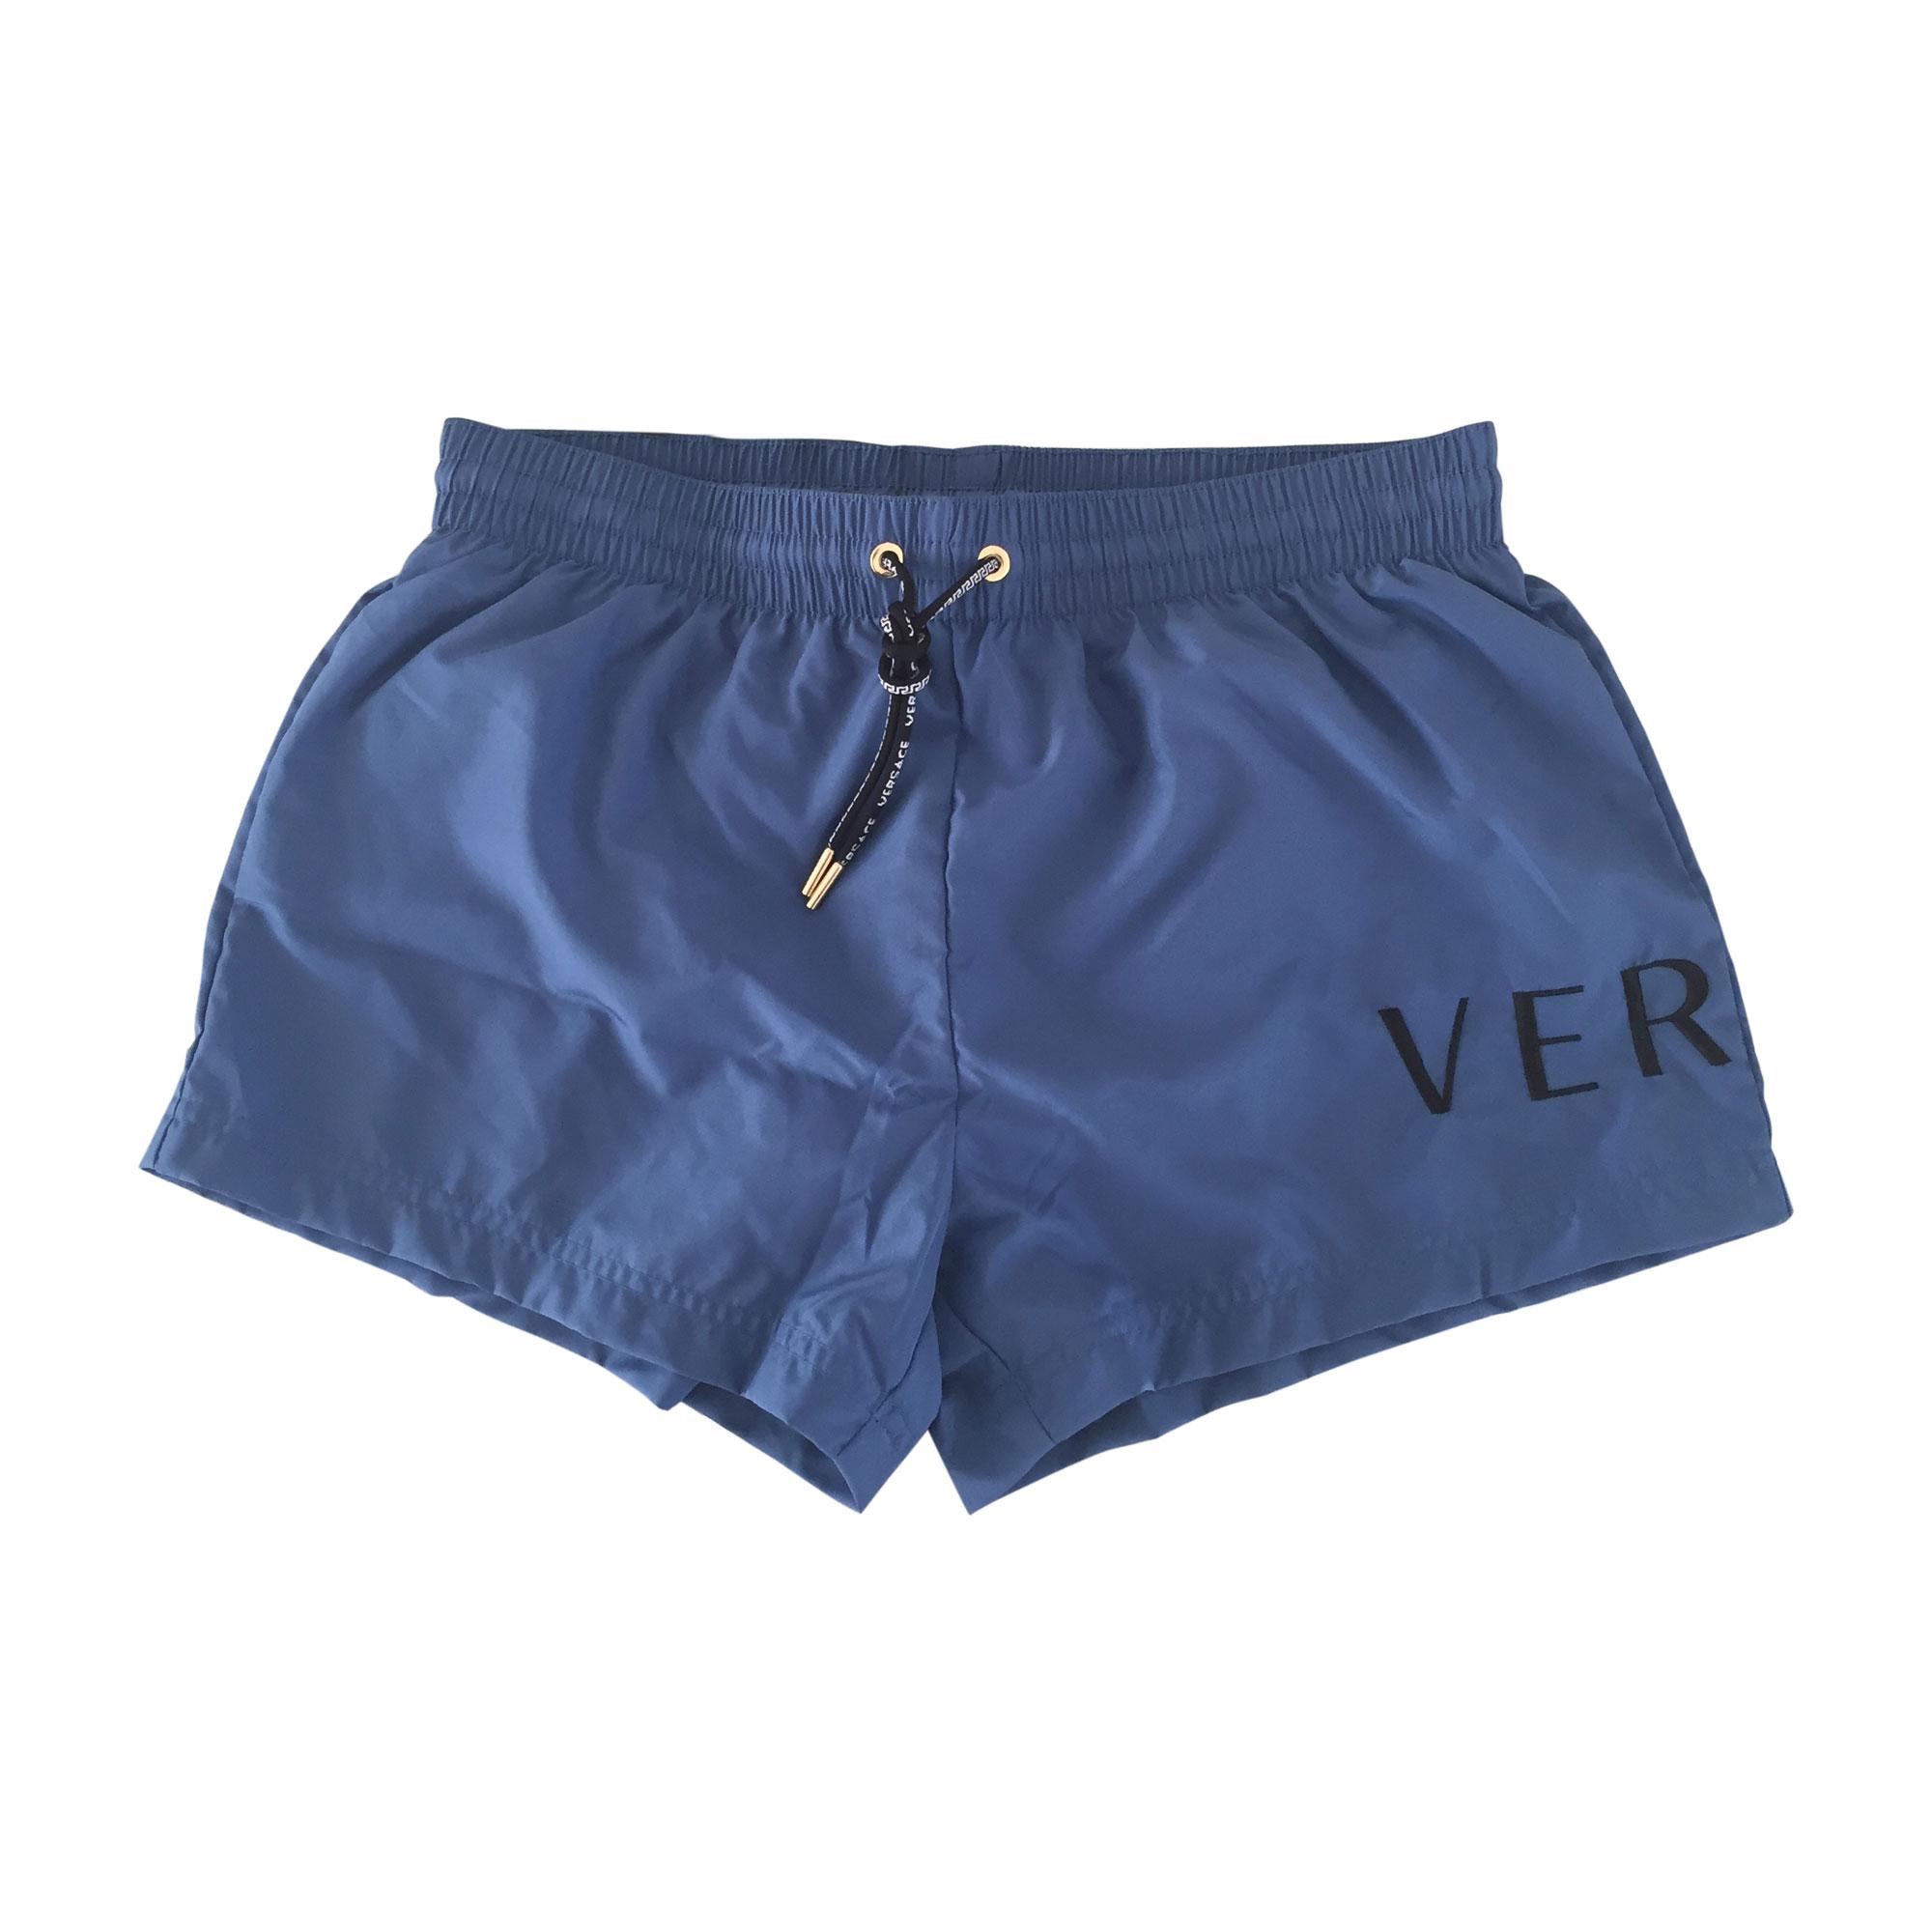 6b47c96295f Short de bain VERSACE 2 (M) bleu - 5174013